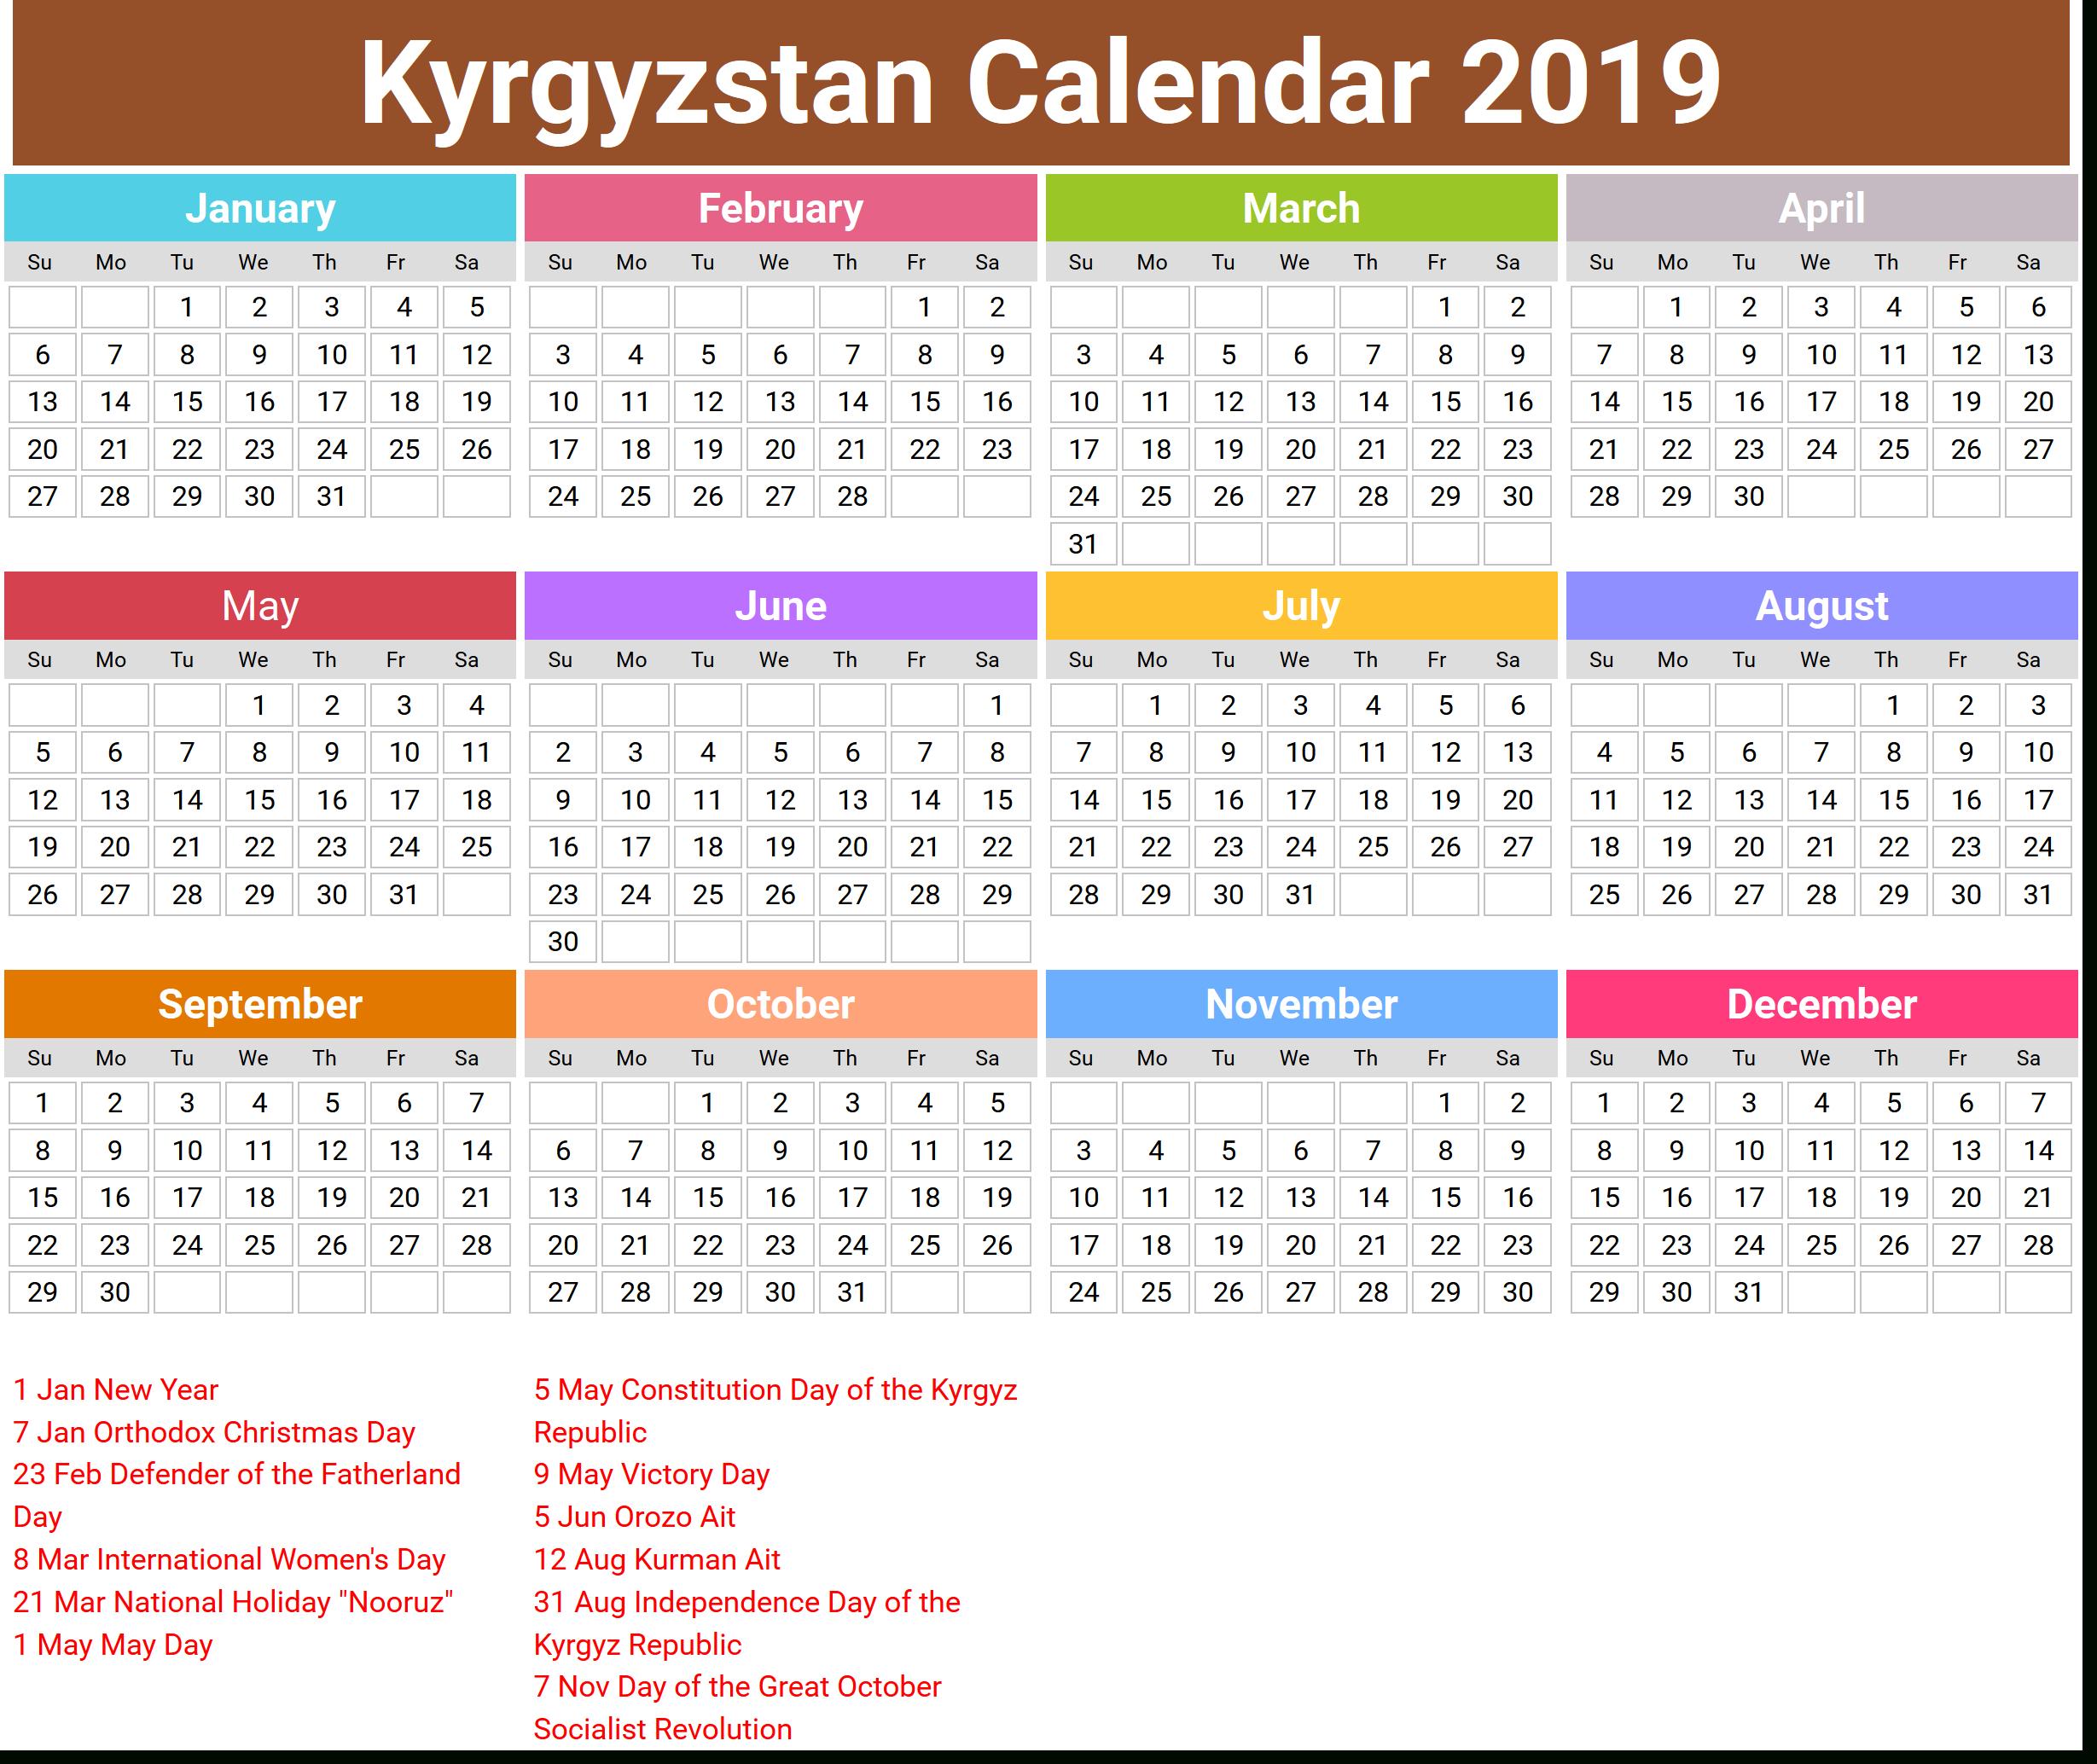 Image For Annual Kyrgyzstan Calendar 2019 | Картинки